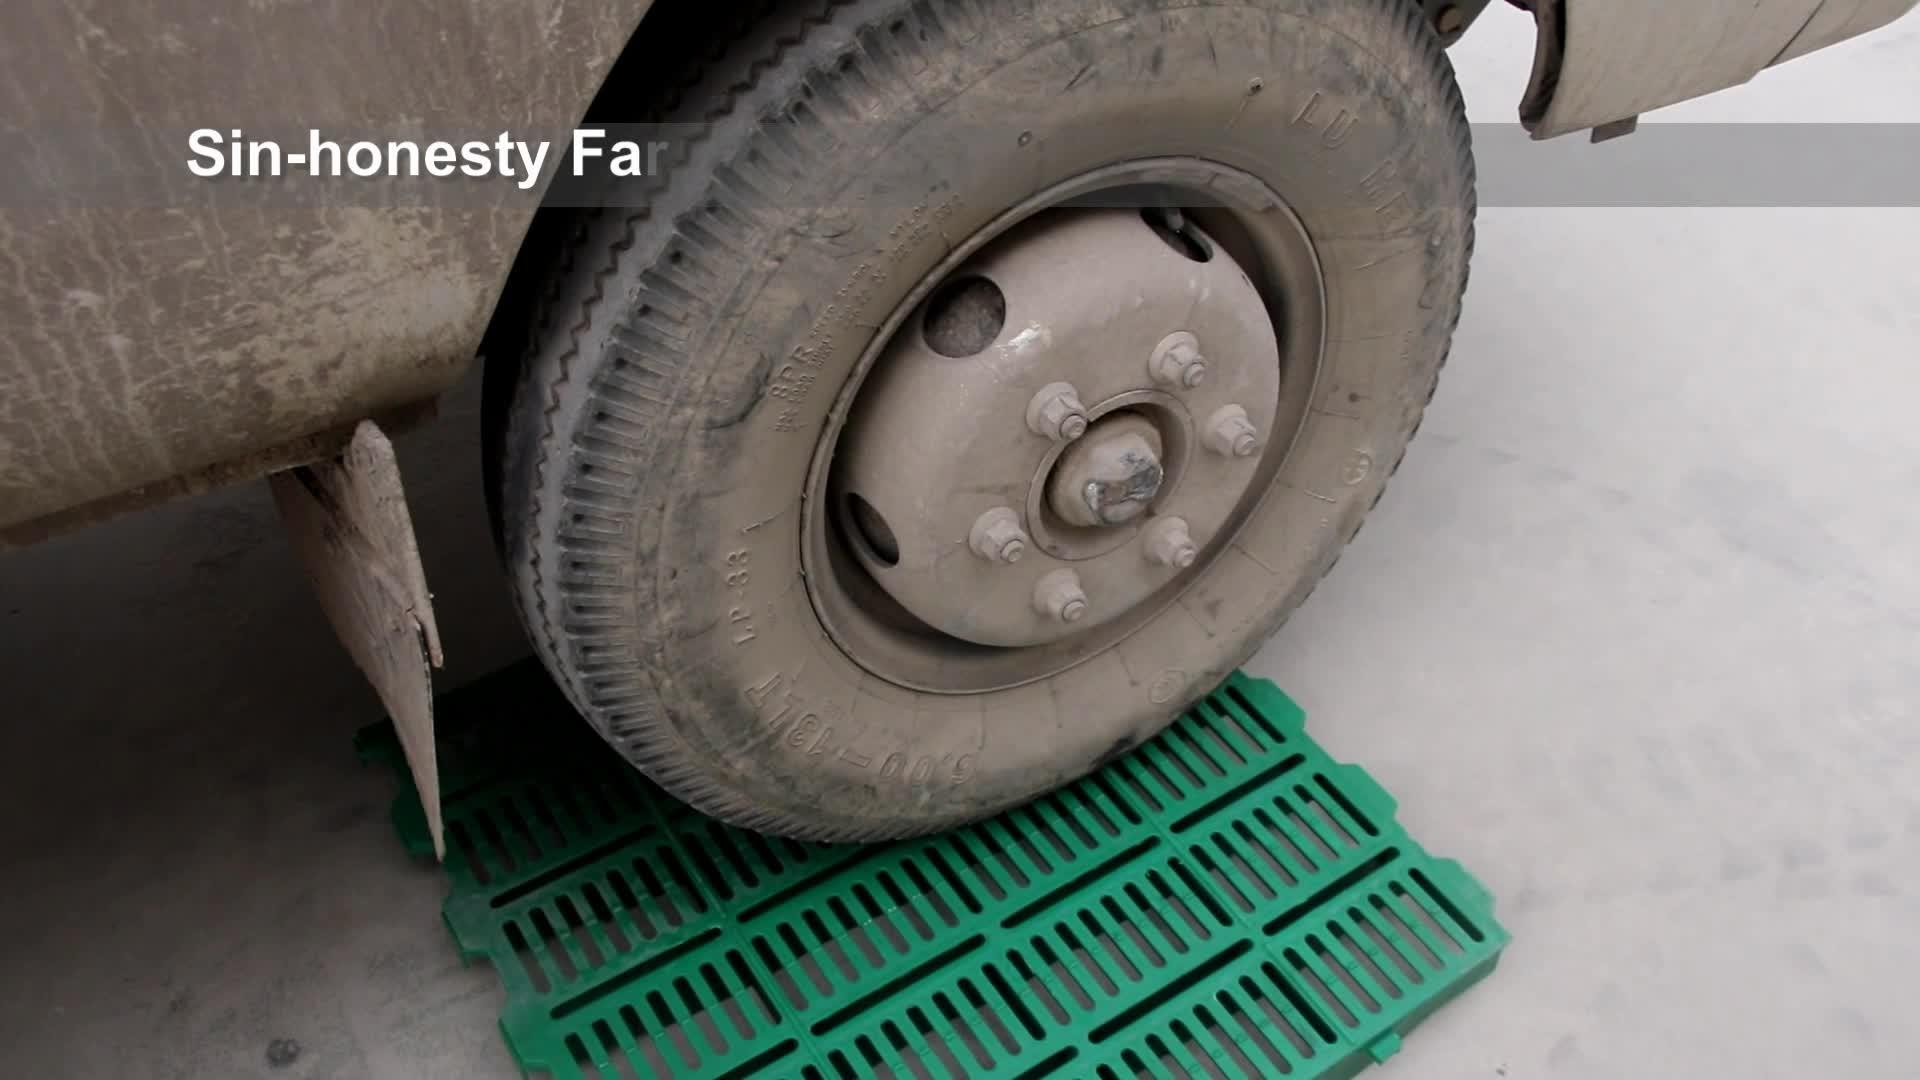 Plastic slatted floor plastic flooring for sow crate piggery equipment